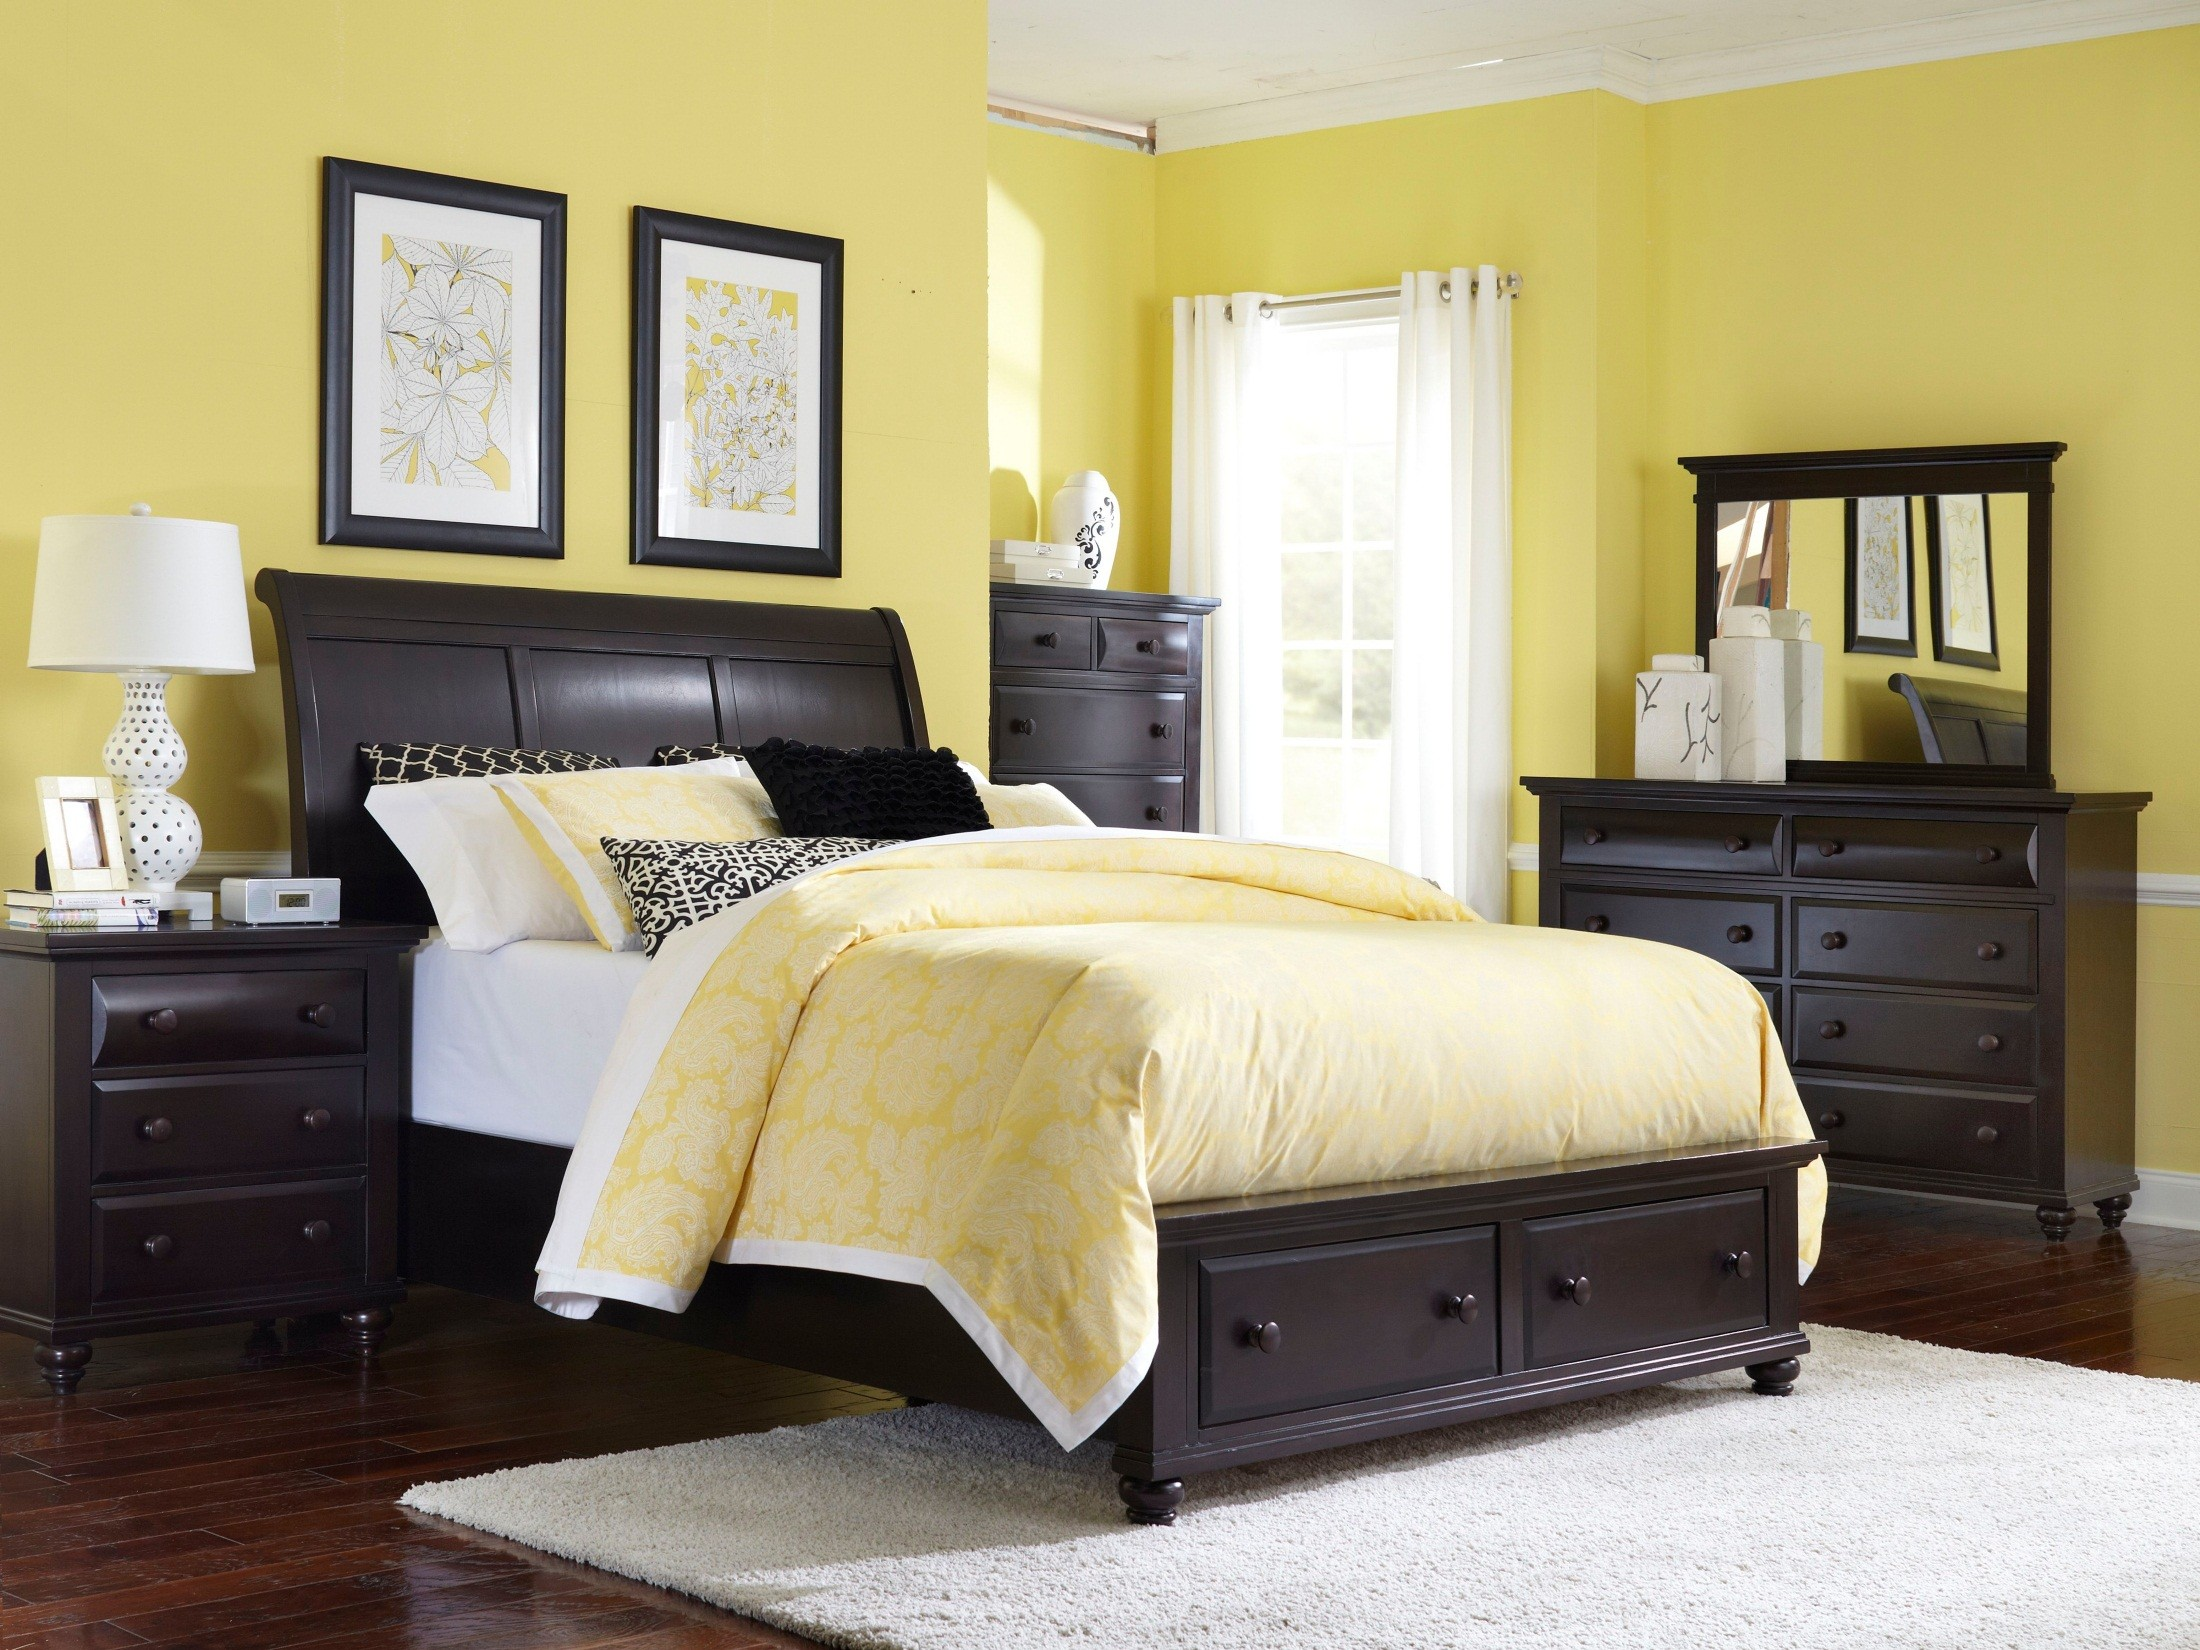 Farnsworth Sleigh Storage Bedroom Set From Broyhill 4856 260 263 460 Coleman Furniture